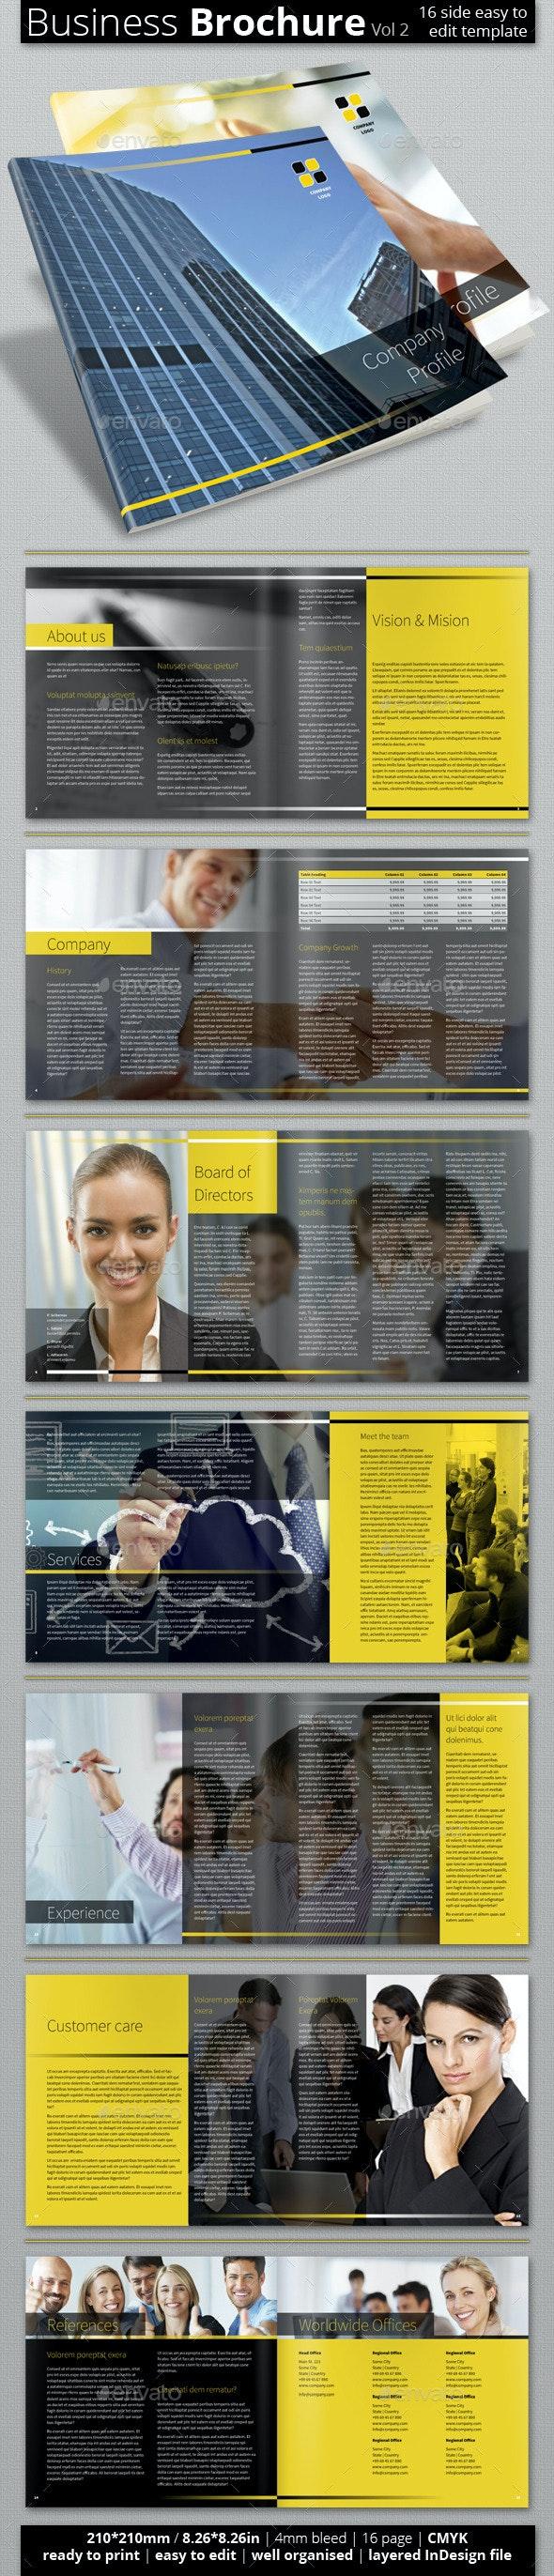 Multipurpose Business Brochure (Vol 2.) - Corporate Brochures